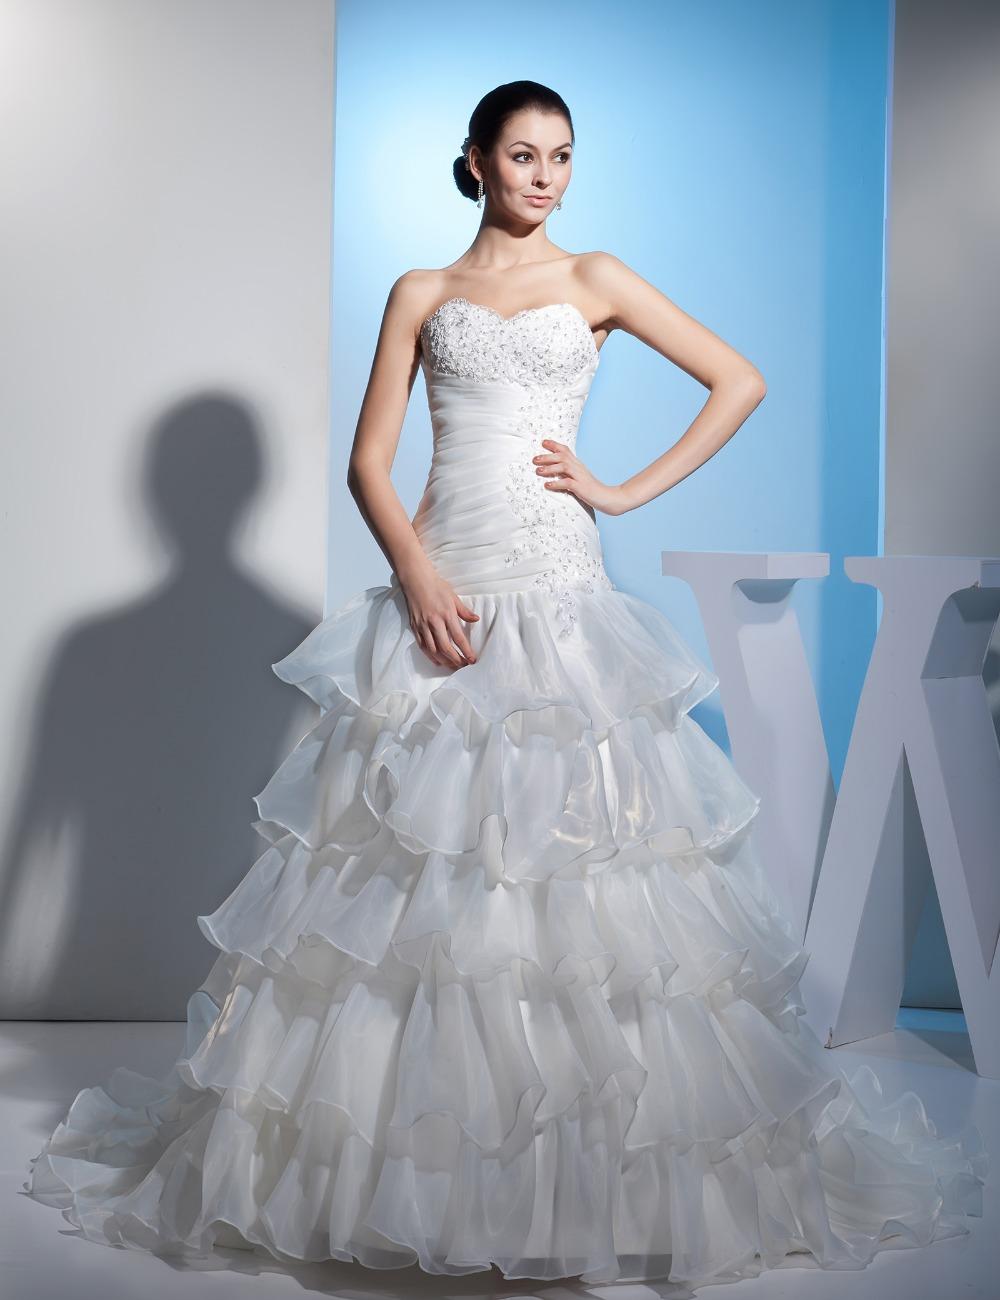 top robes blog robe de mariee italienne pas cher. Black Bedroom Furniture Sets. Home Design Ideas